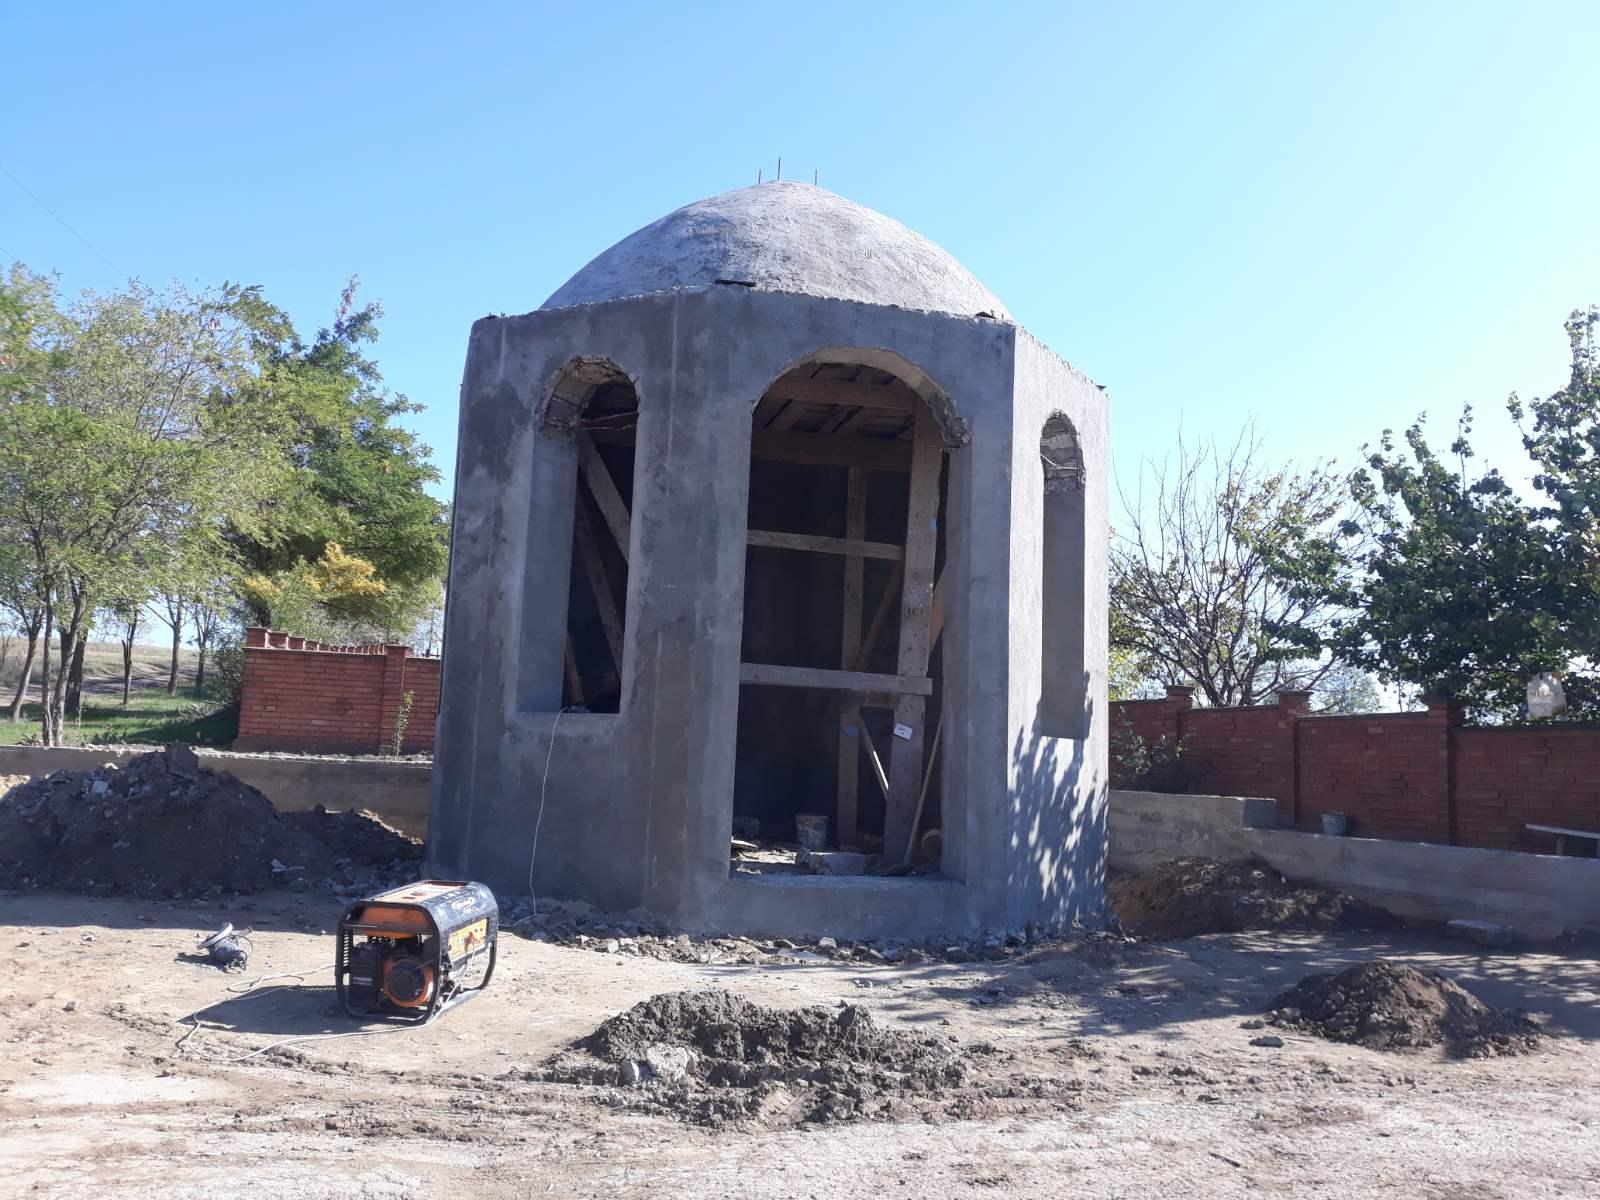 (ФОТО) В Вулканештах на территории кладбища строится часовня